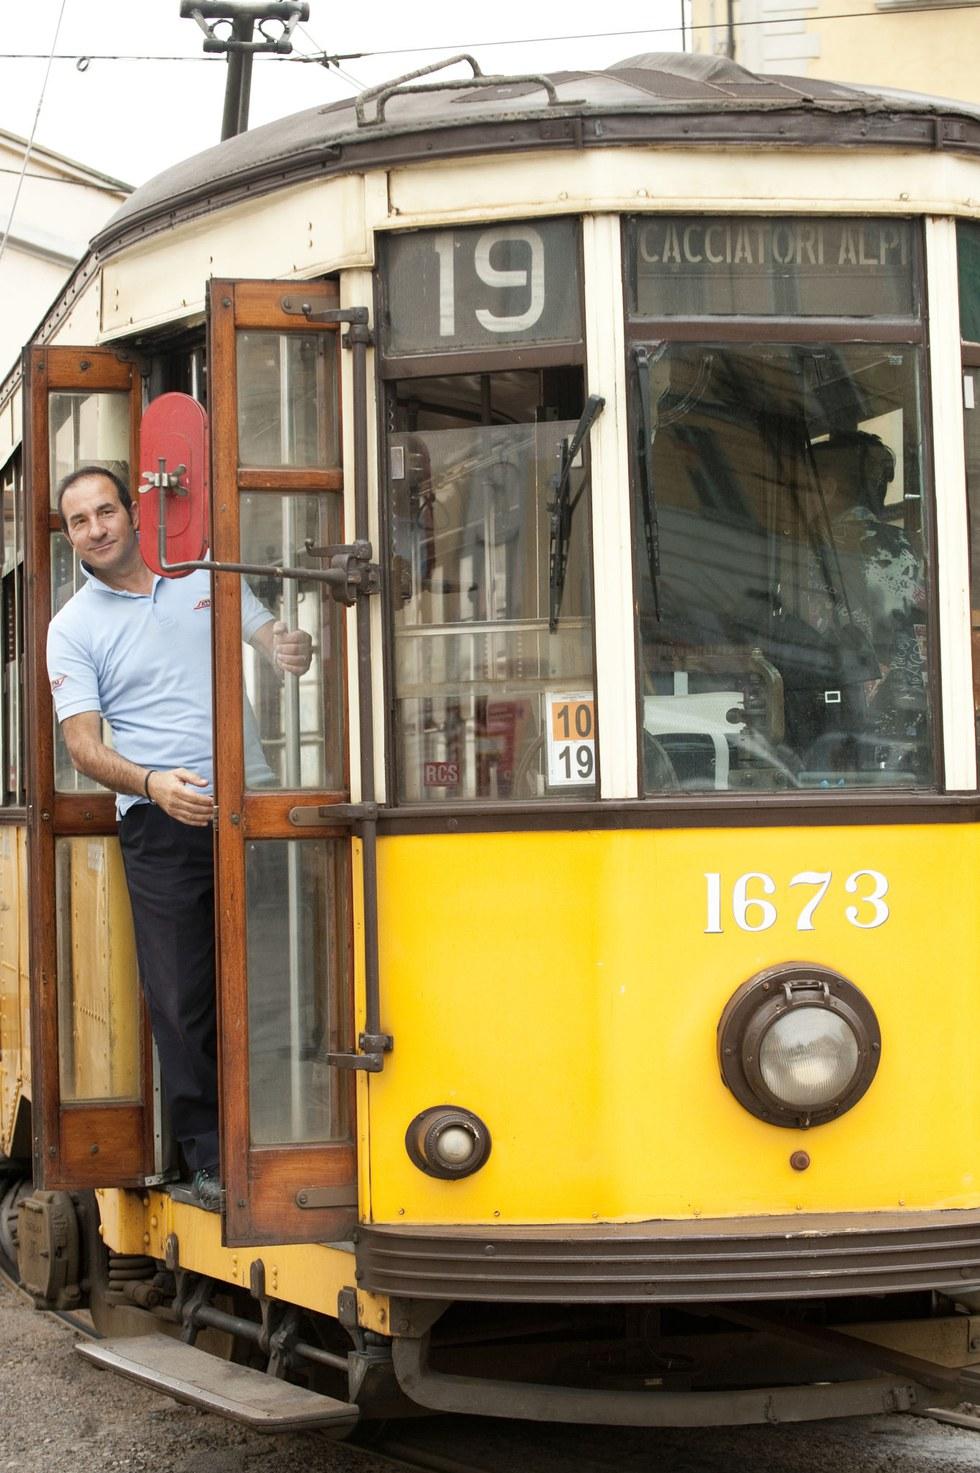 A streetcar in artsy Navigli